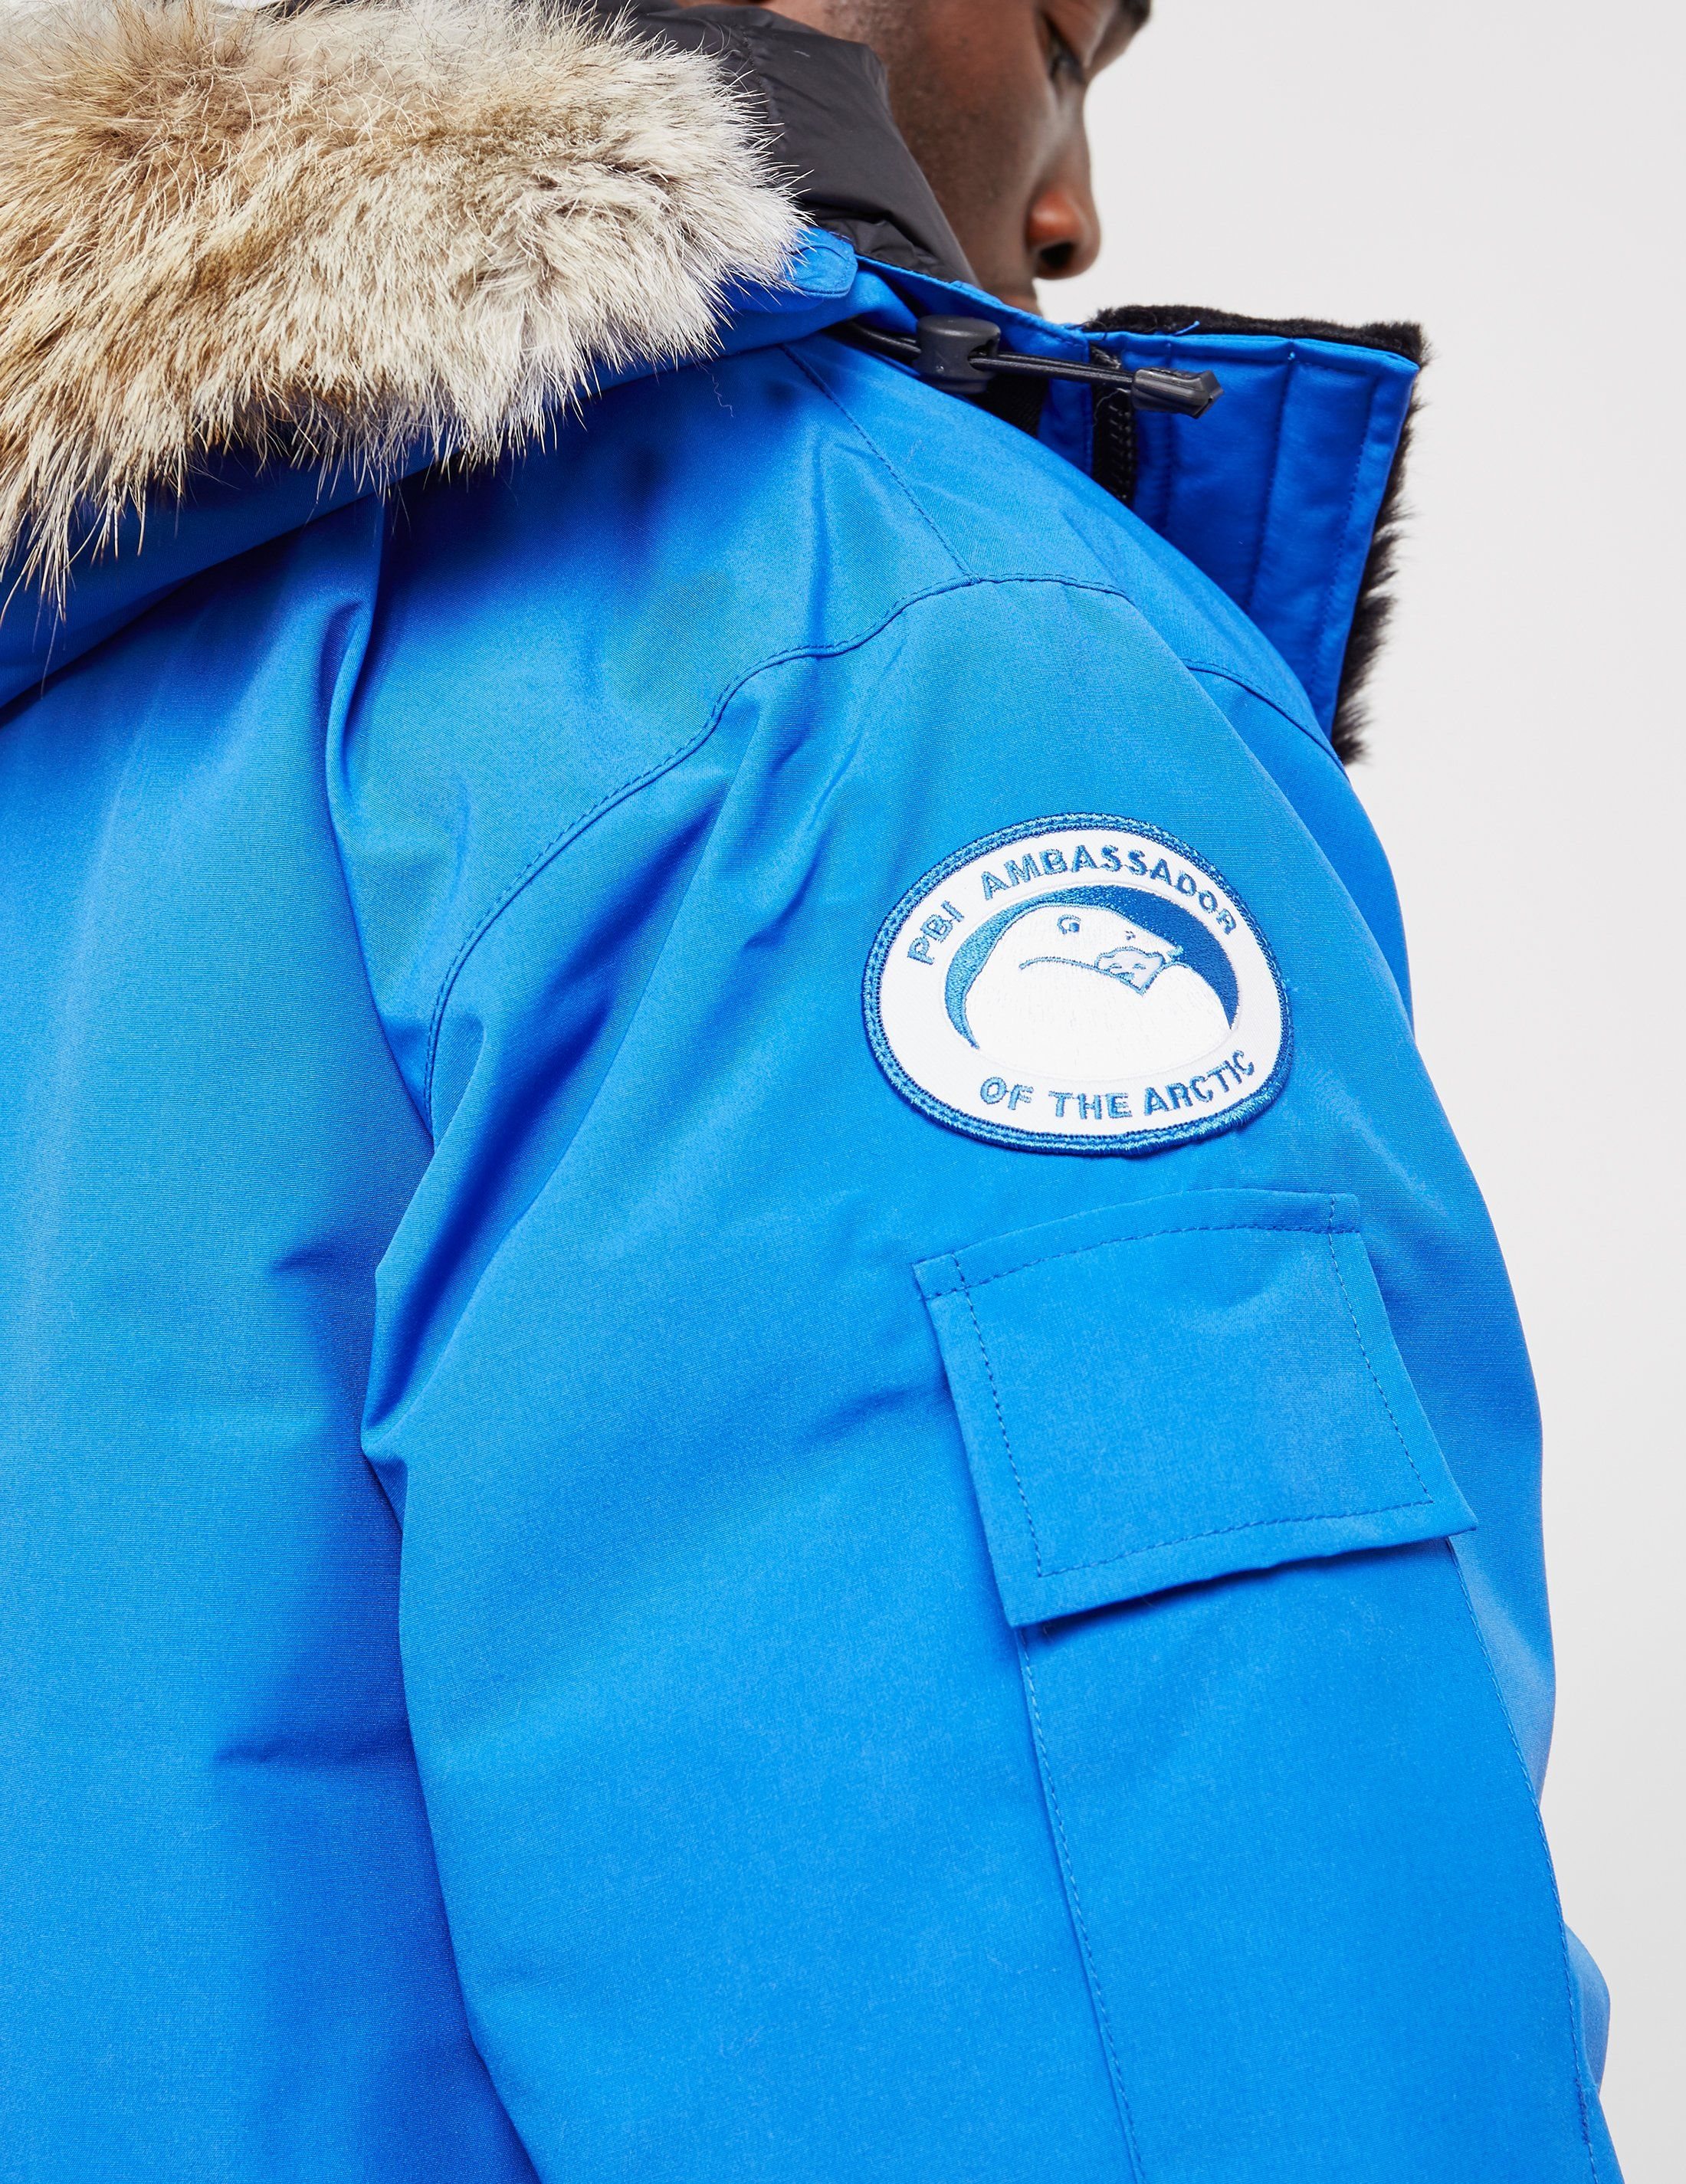 Canada Goose Expedition PBI Jacket